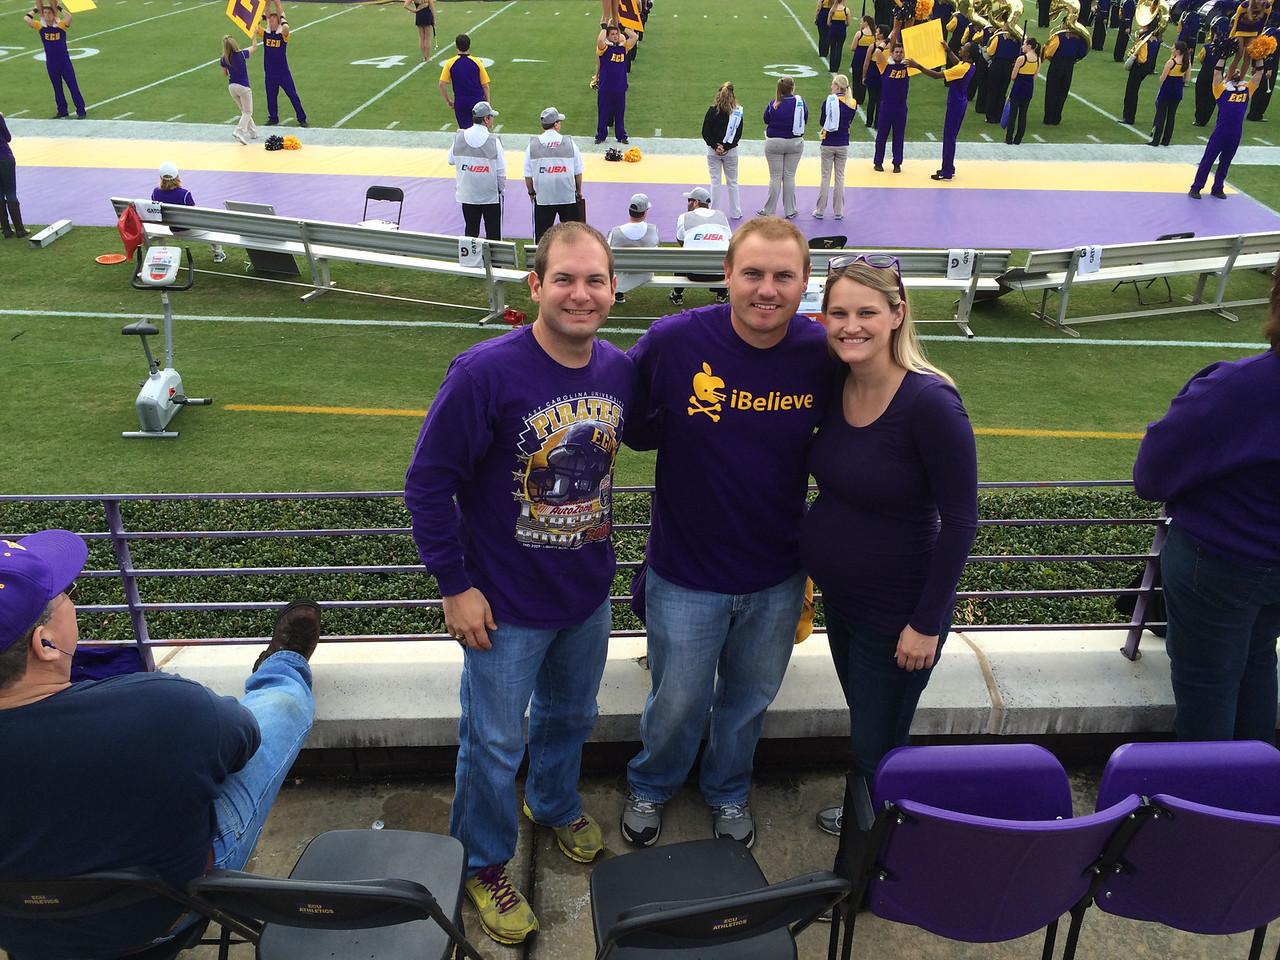 11/16 ECU vs UAB  At our seats: Jon, JG, Stephanie